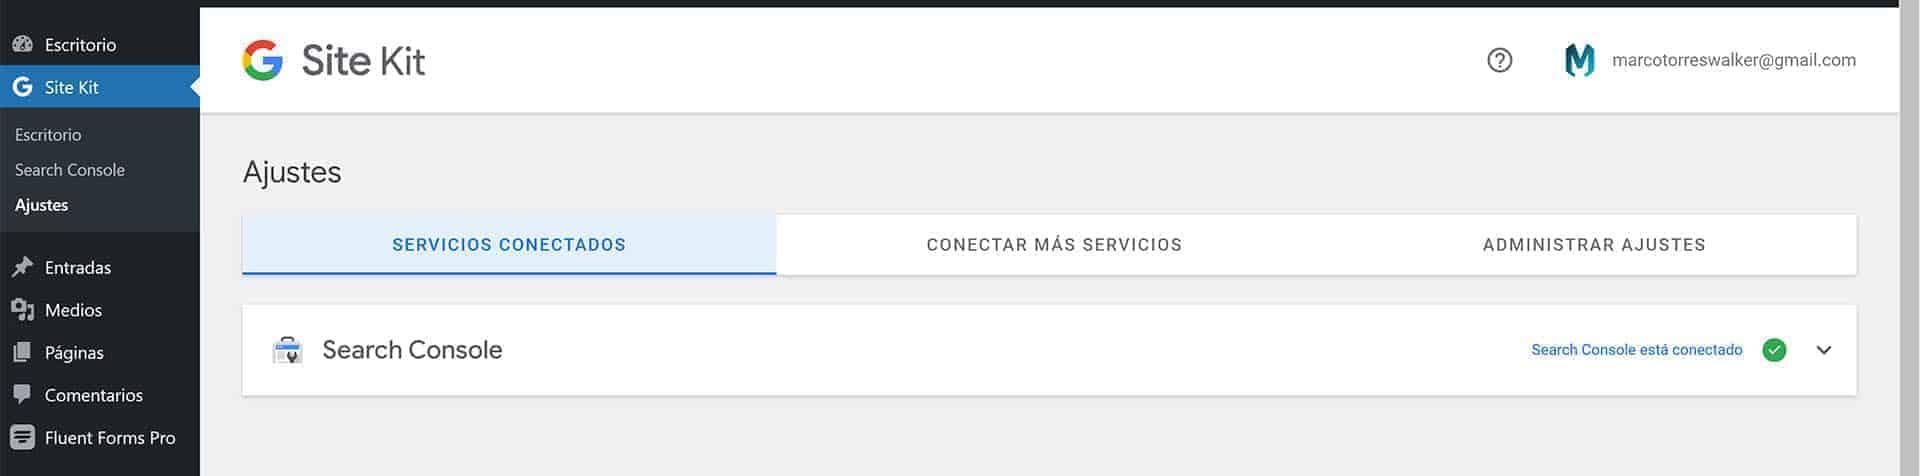 Configuración de Google Site Kit en WordPress.